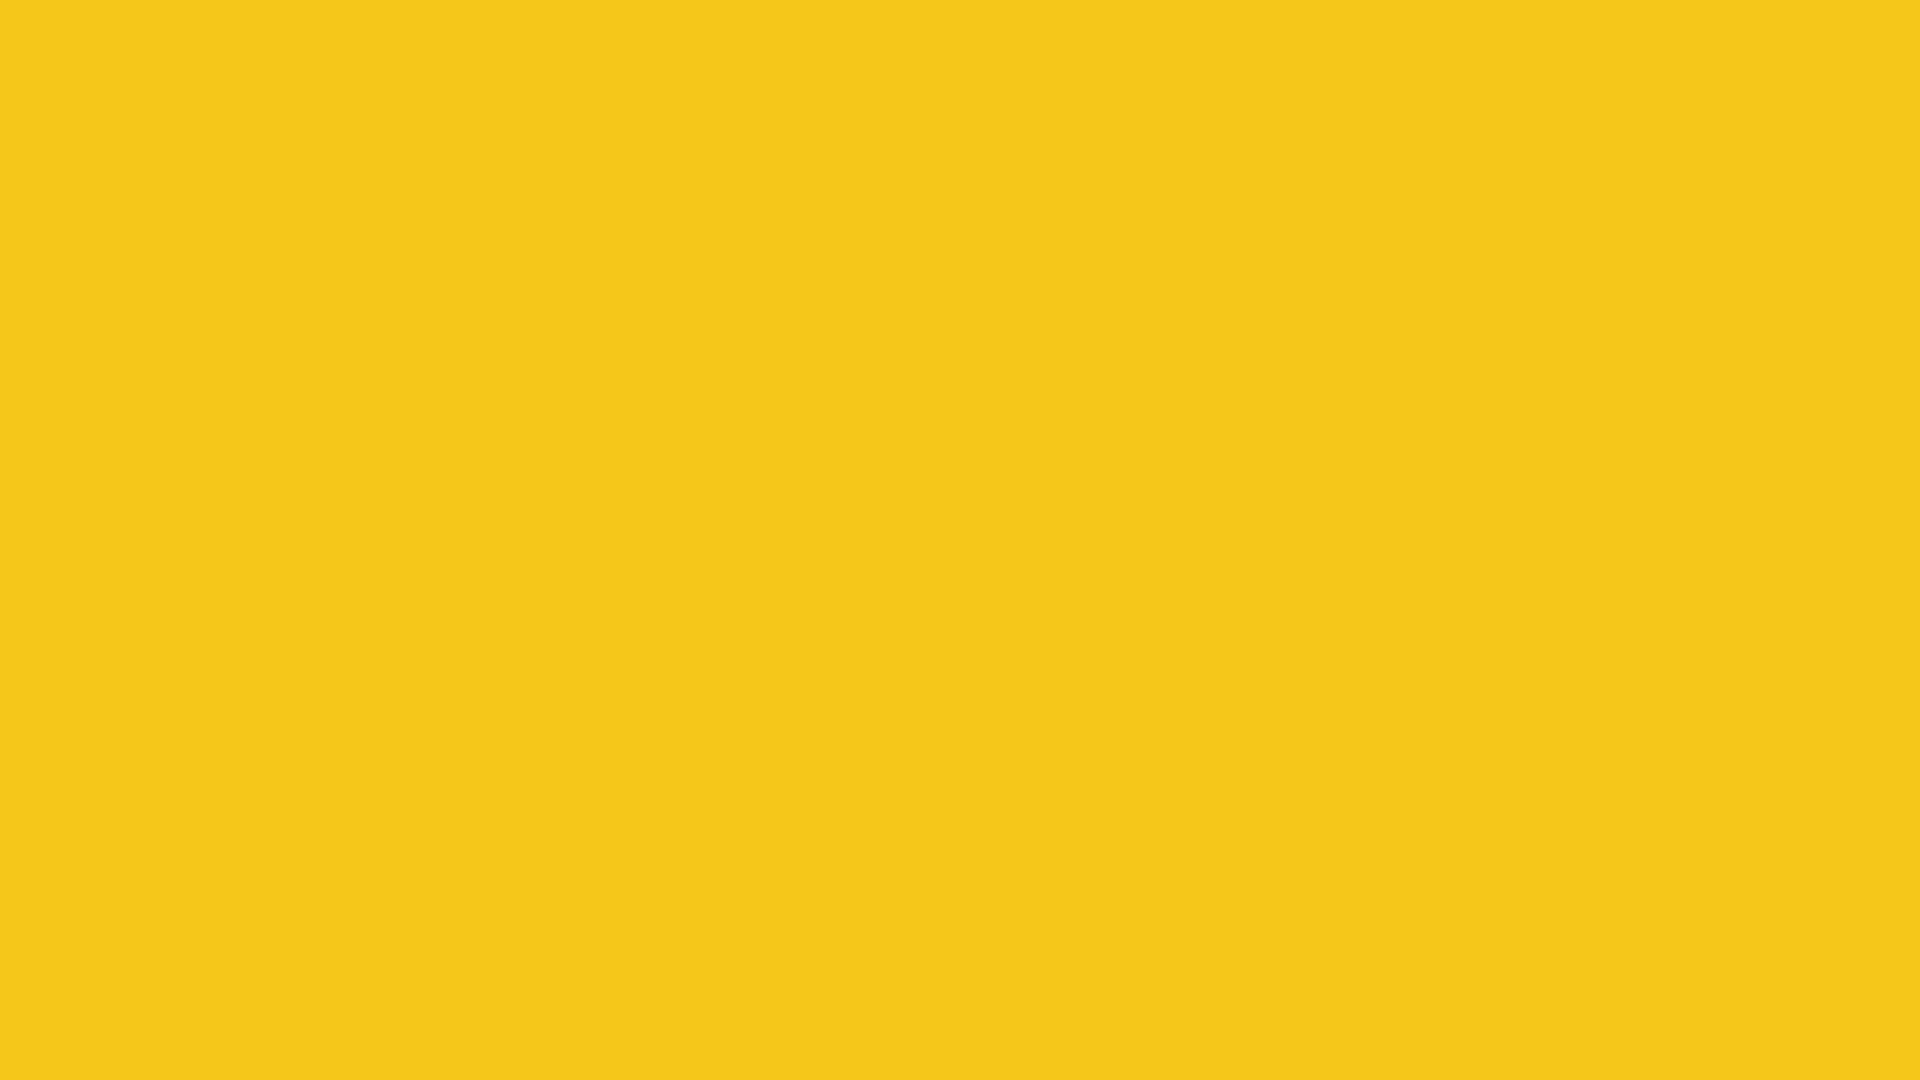 1920x1080 Deep Lemon Solid Color Background